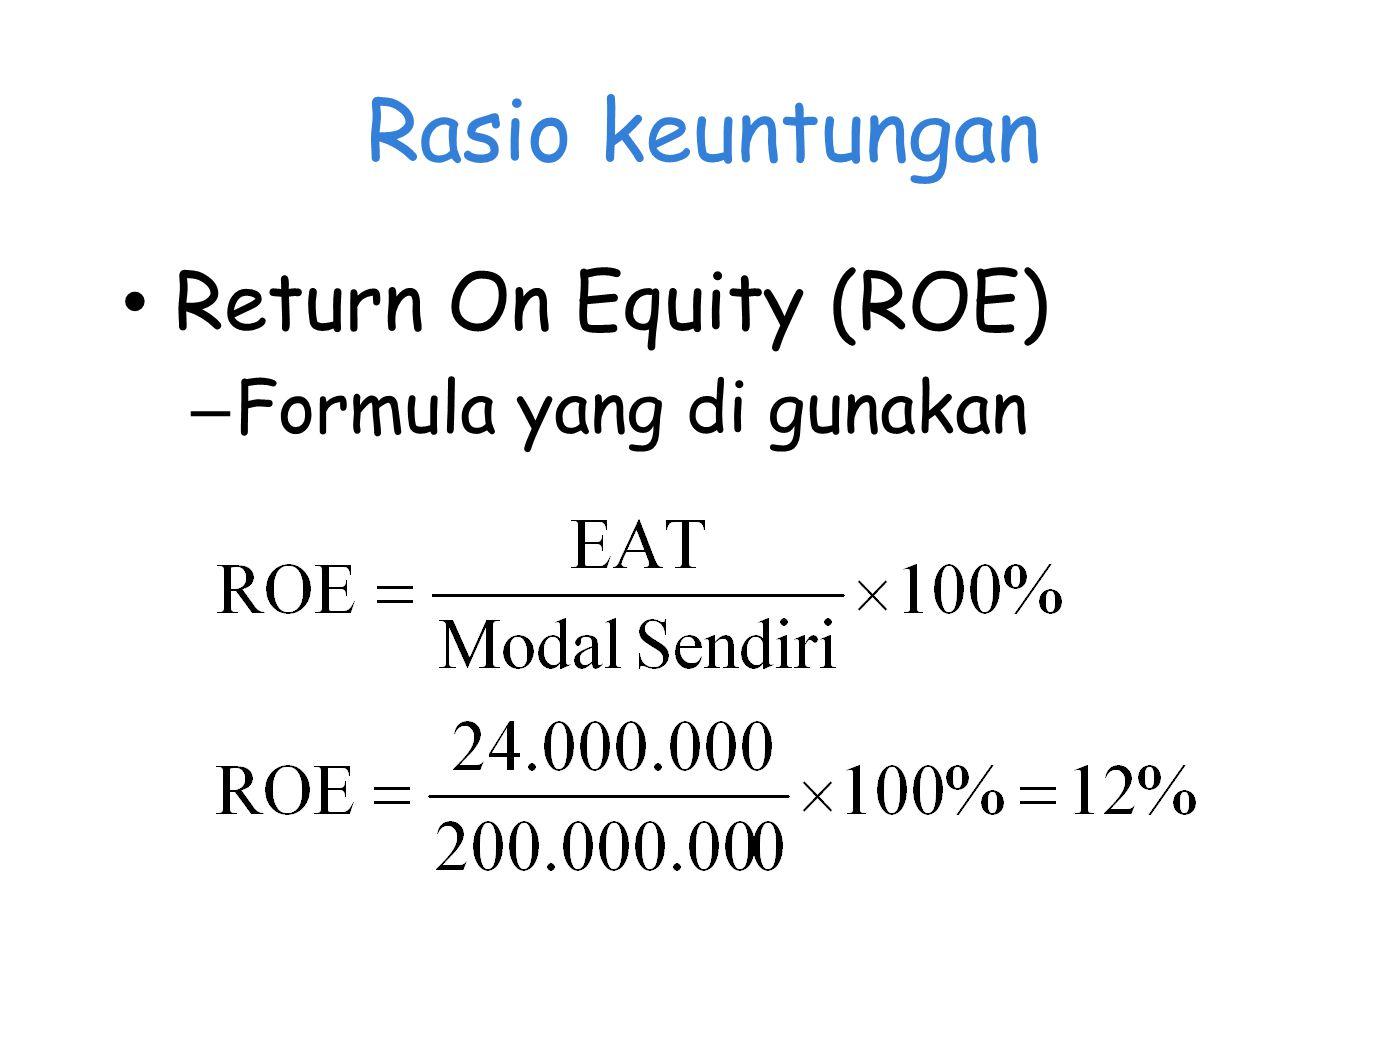 Rasio keuntungan Return On Equity (ROE) Formula yang di gunakan